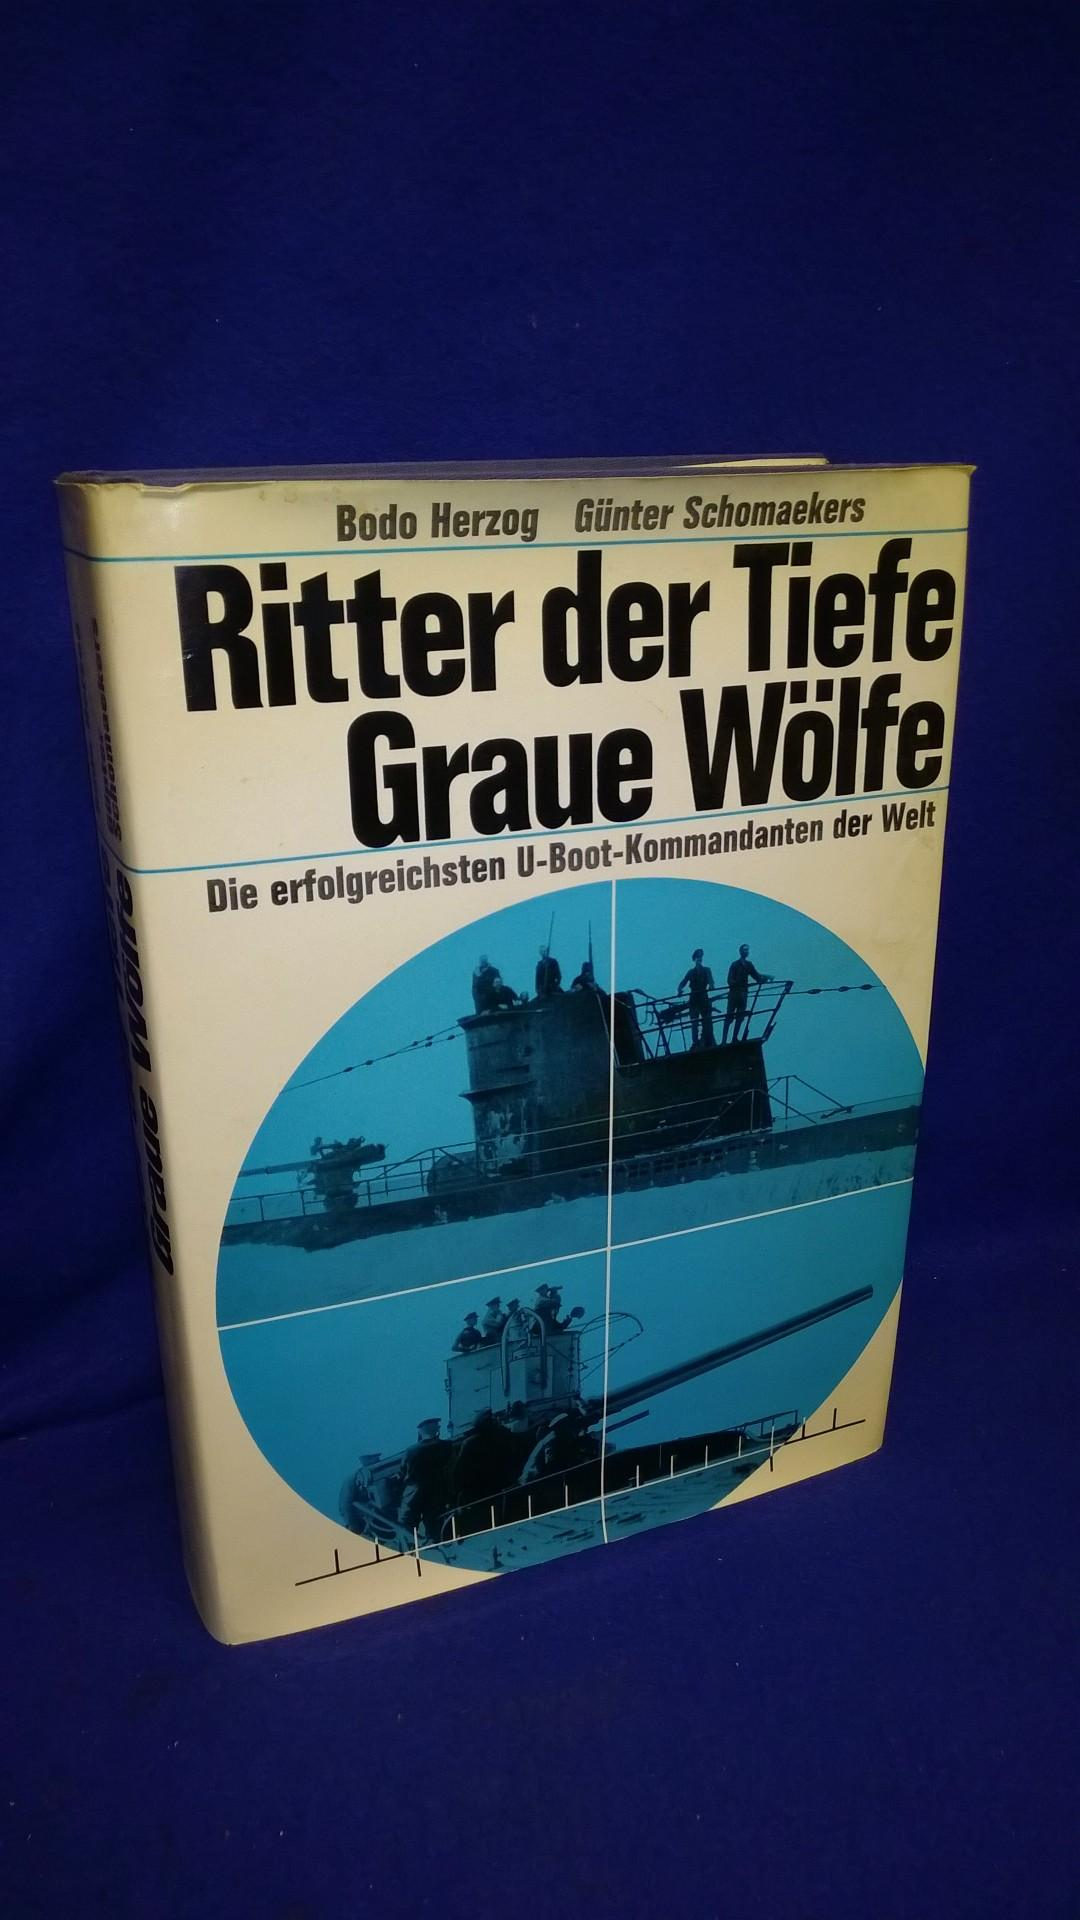 Berühmt Drahtspleißtechniken Galerie - Der Schaltplan - traveltopus.info